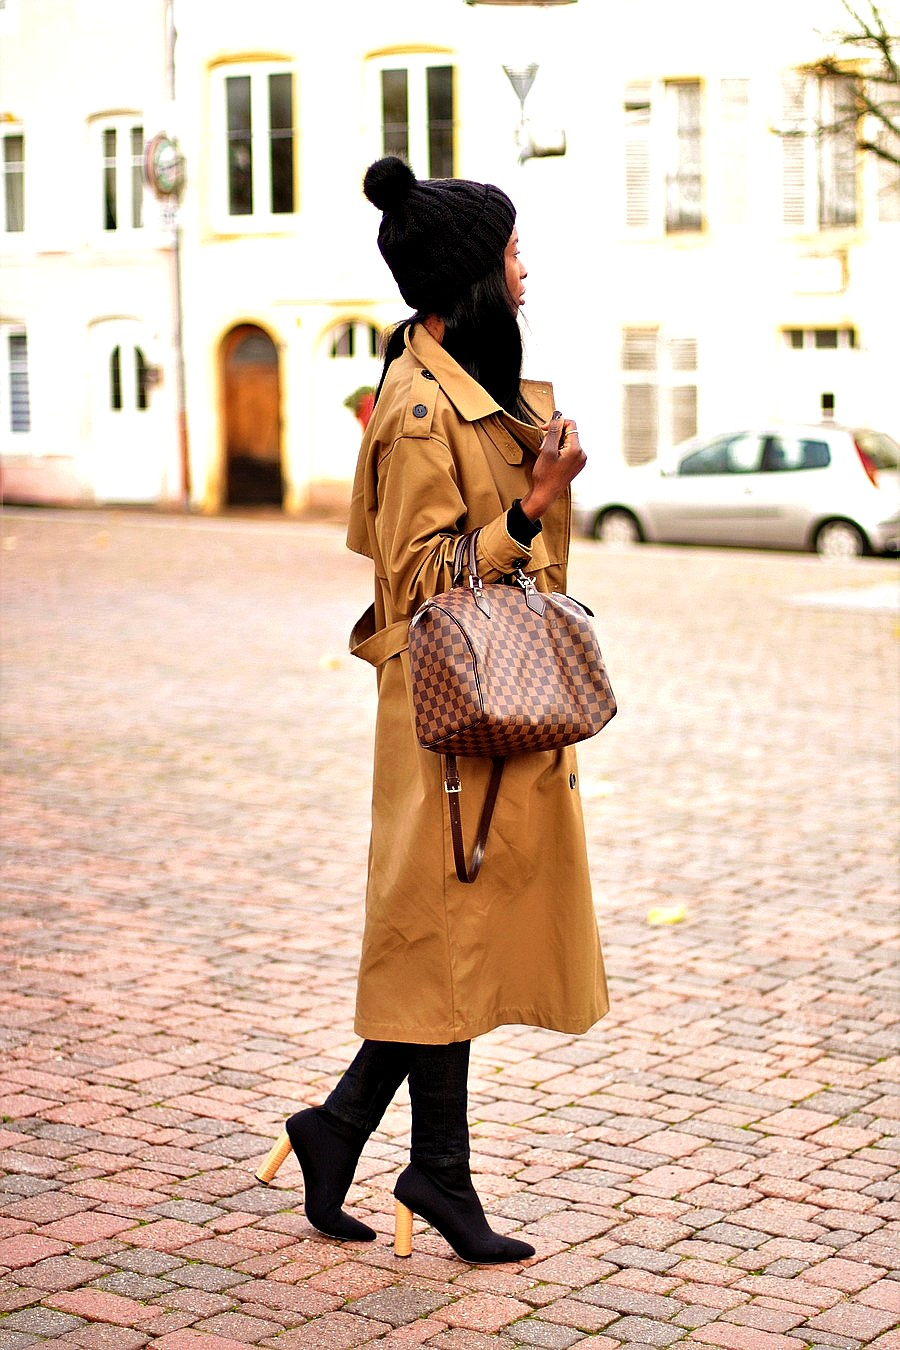 idee-look-bonnet-pompon-trench-sac-louis-vuitton-bottines